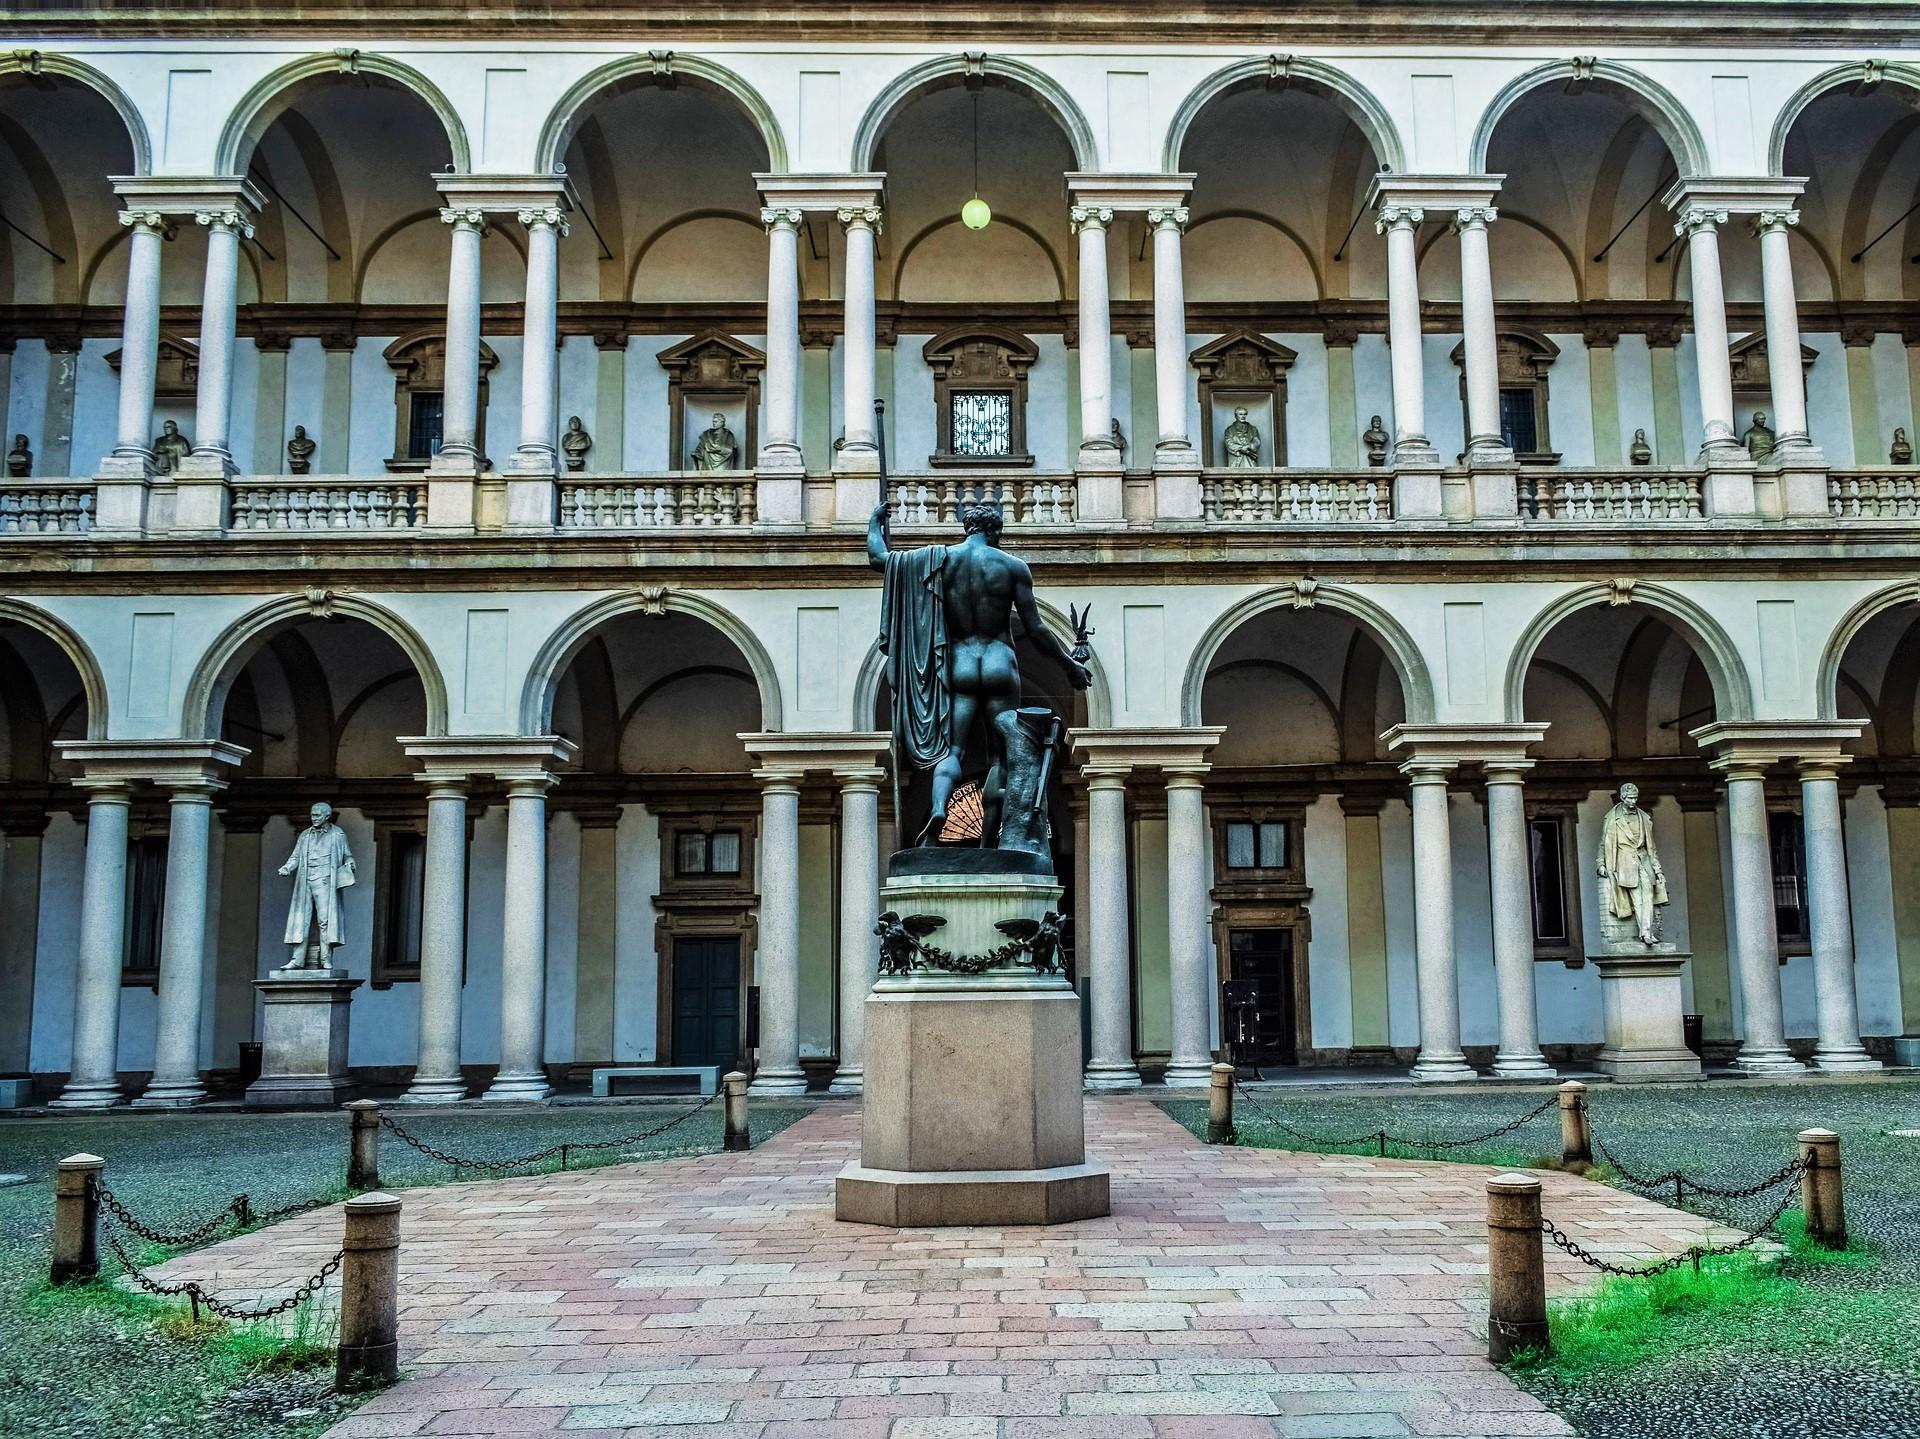 Impressive Pinacoteca di Brera - The Brera Art Gallery in Milan, Italy